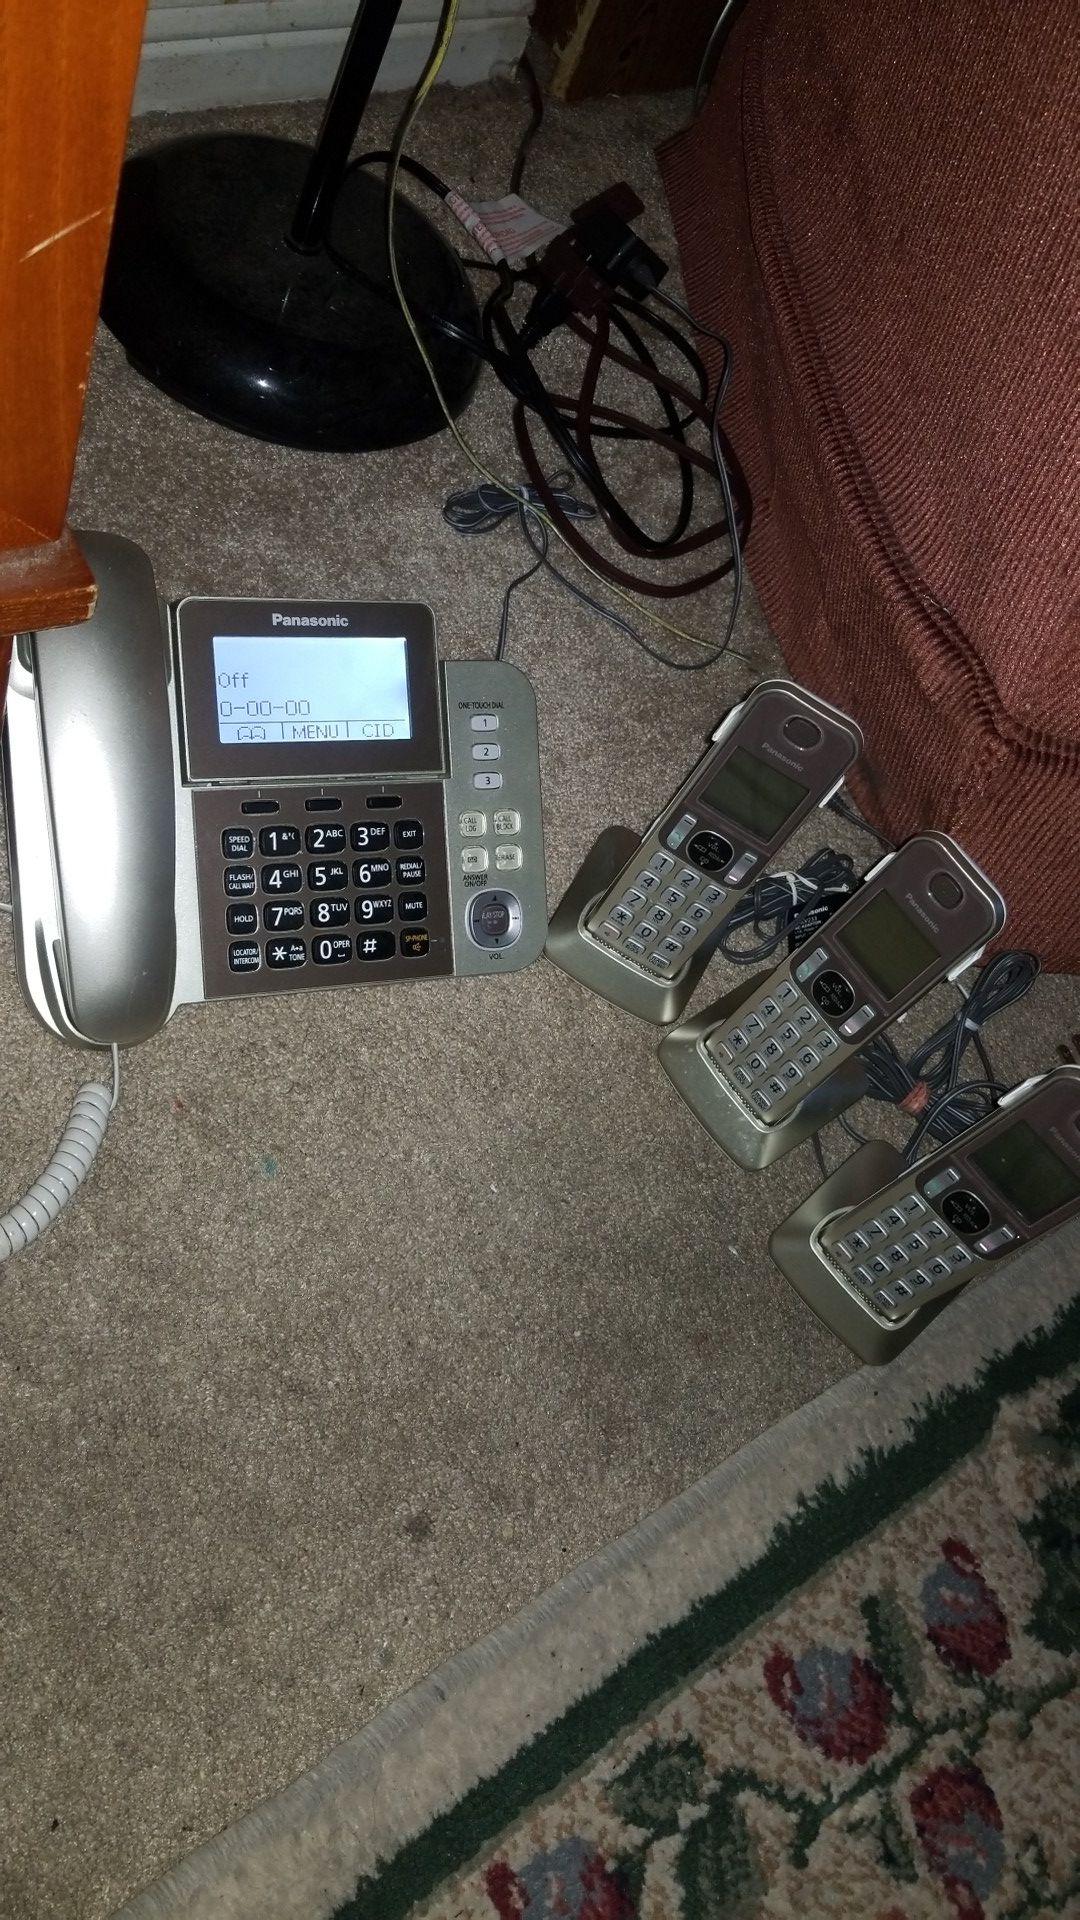 Panasonic, phone system - cordless